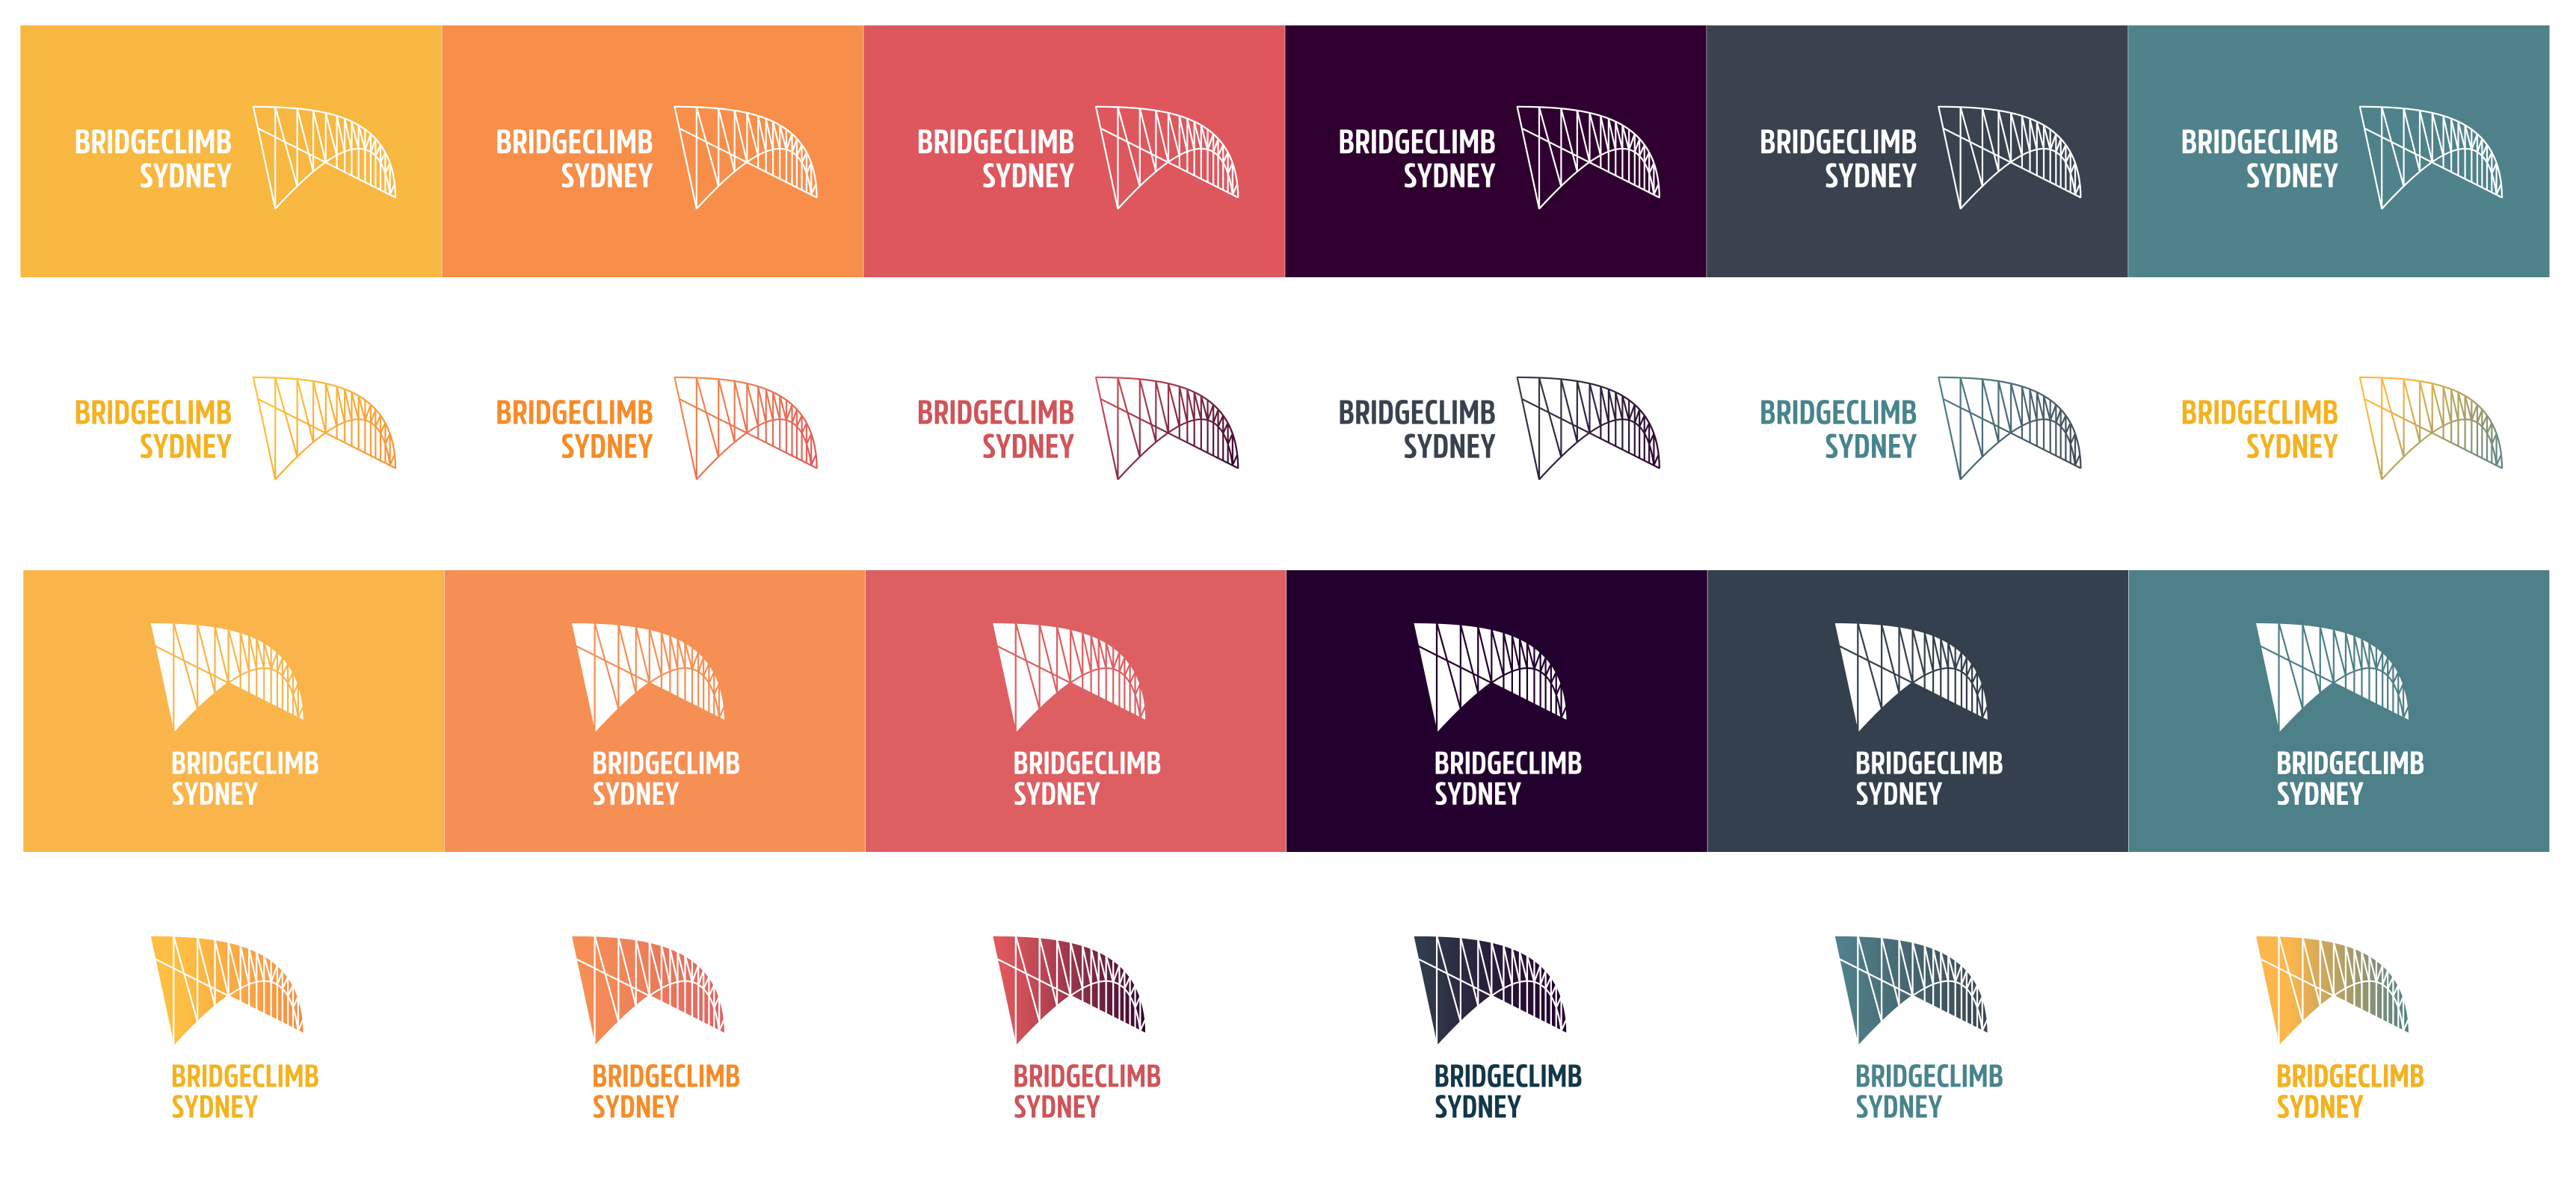 Iconic BridgeClimb Sydney celebrates with a 21st birthday brand refresh + identity via The Works